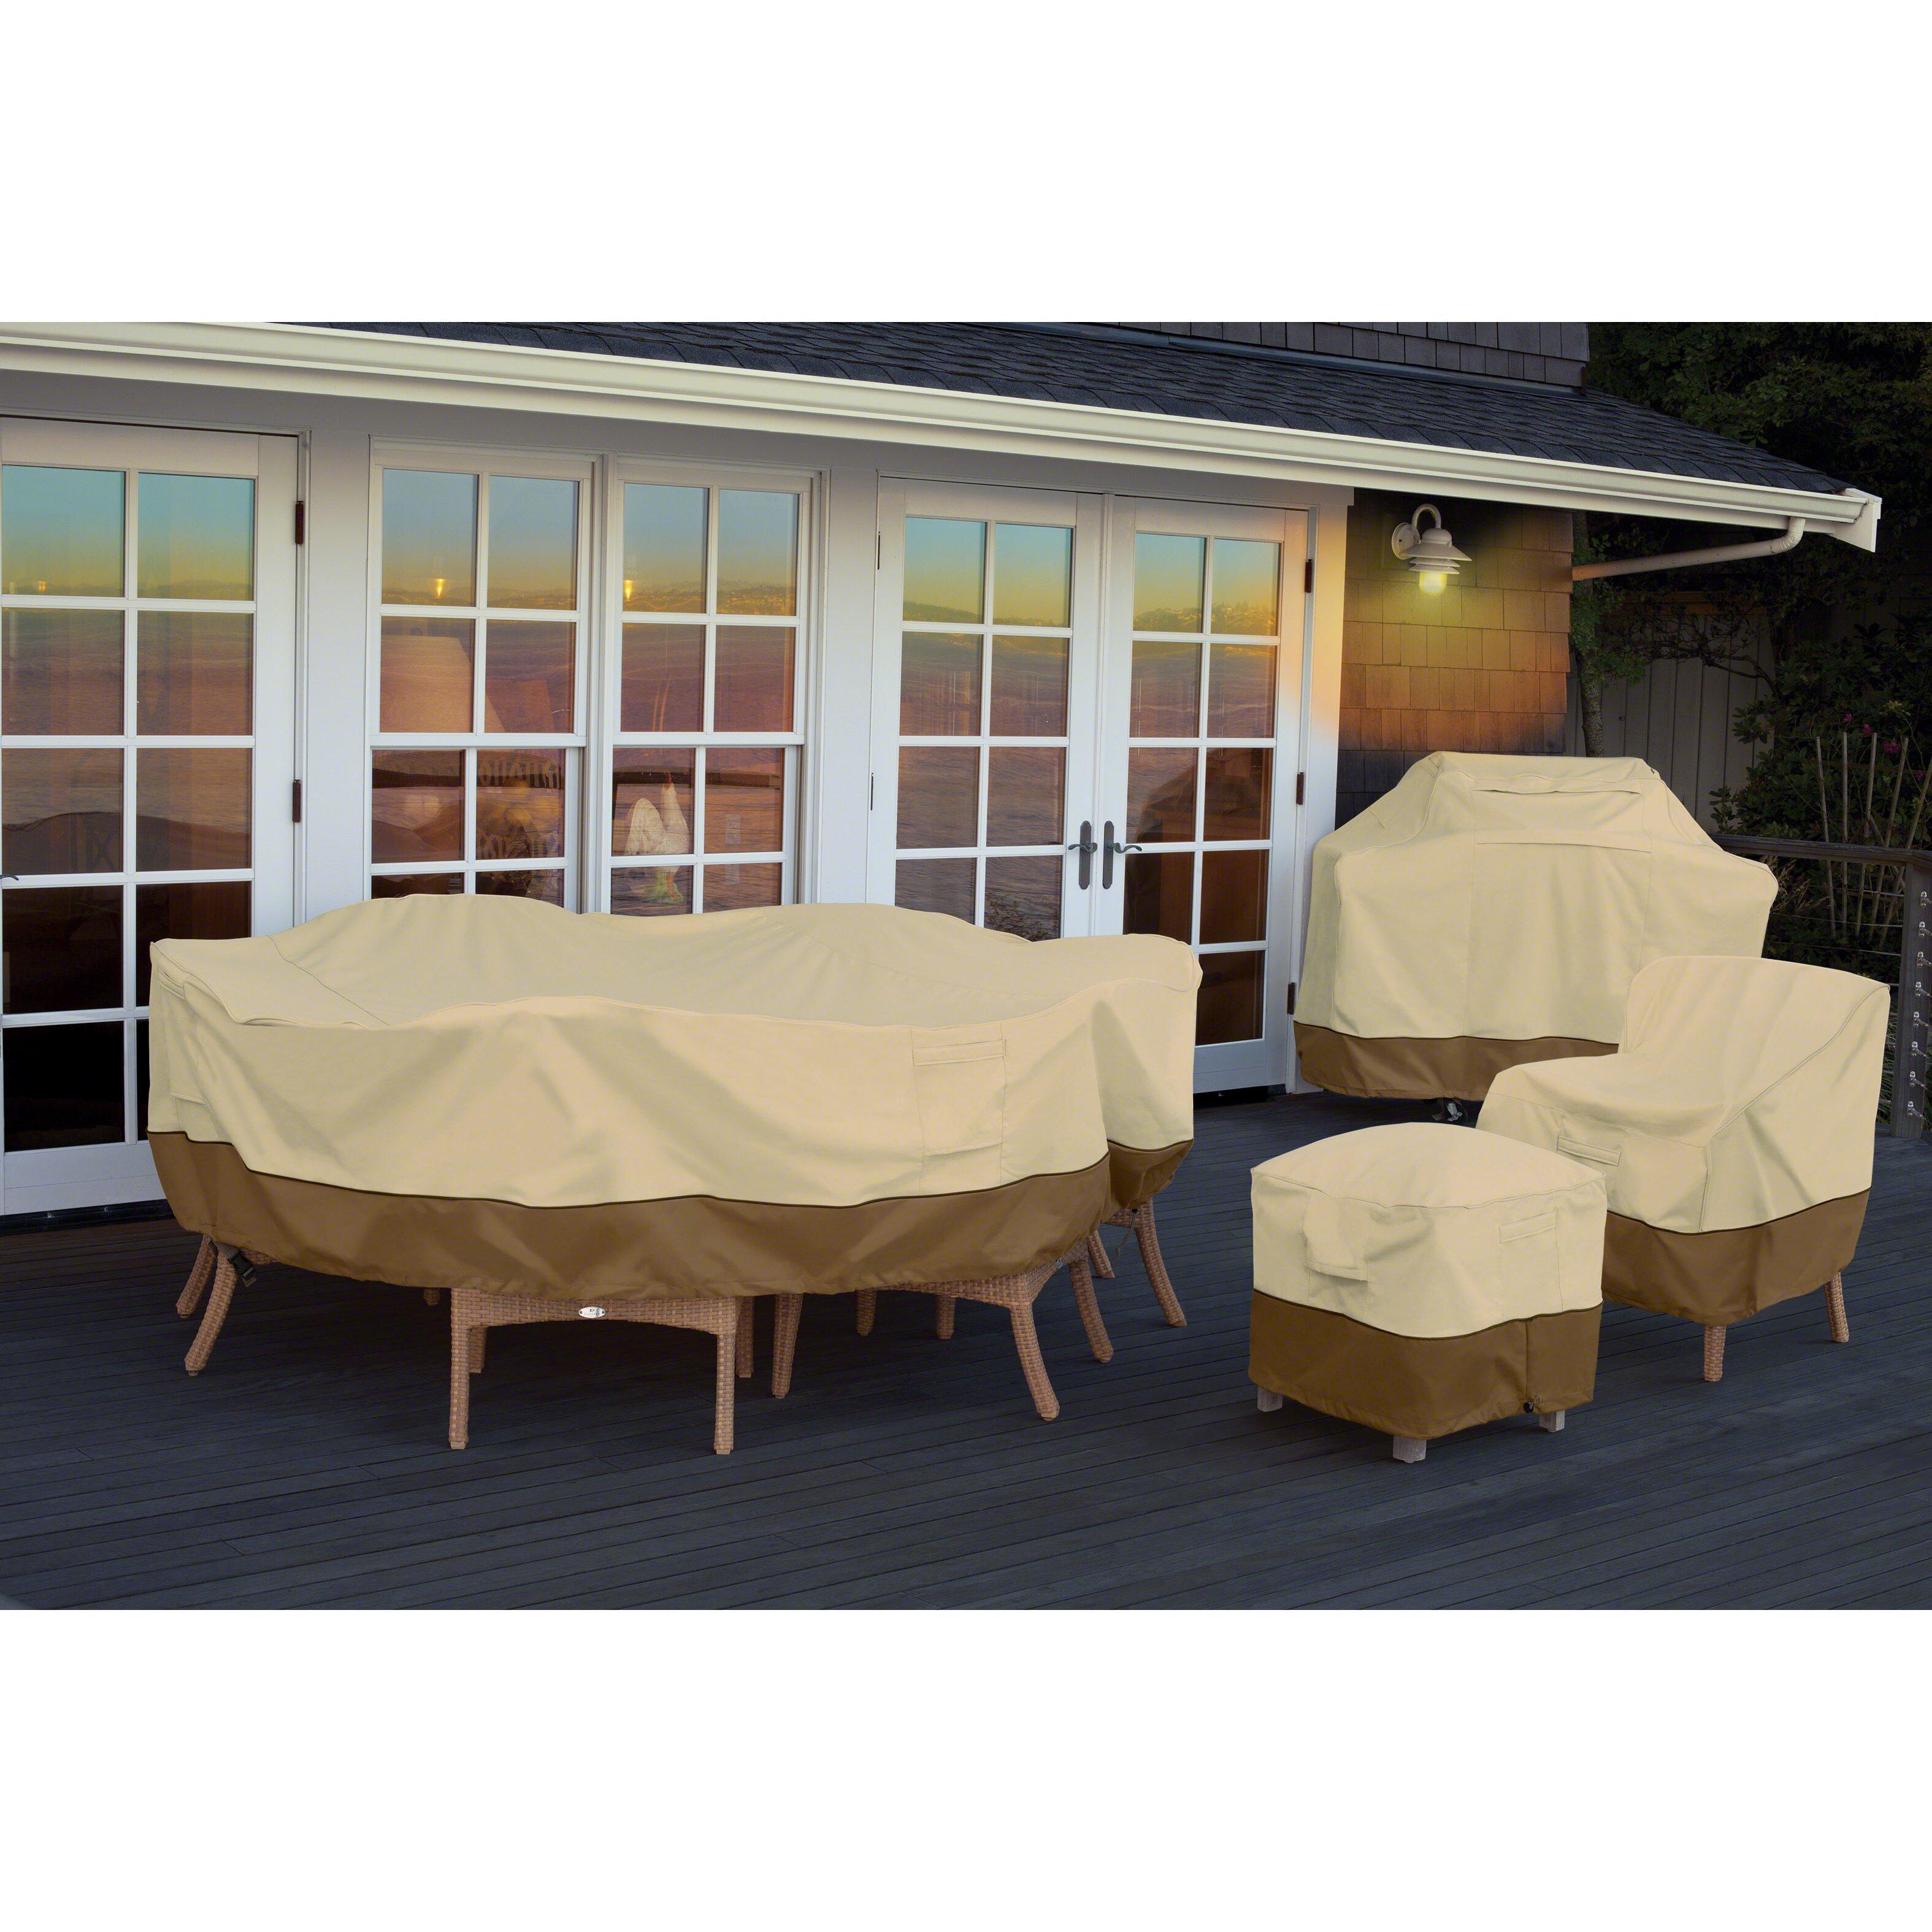 Classic Accessories Veranda Patio Table & Chair Set Cover & Reviews